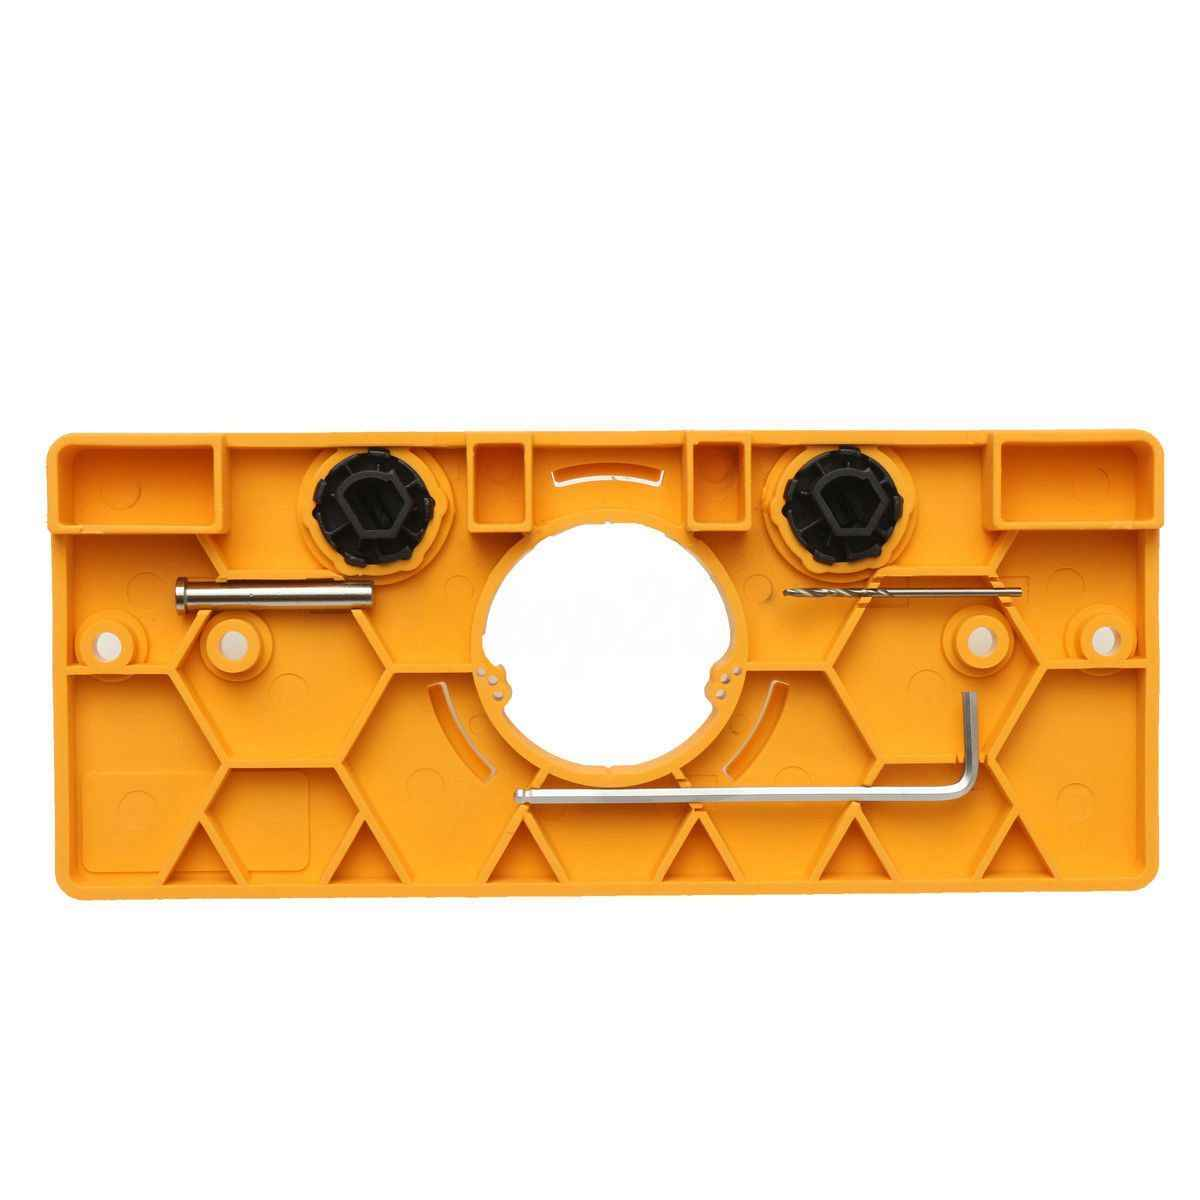 35mm כוס סגנון ציר משעמם לנענע תרגיל מדריך סט דלת חור תבנית עבור Kreg כלי